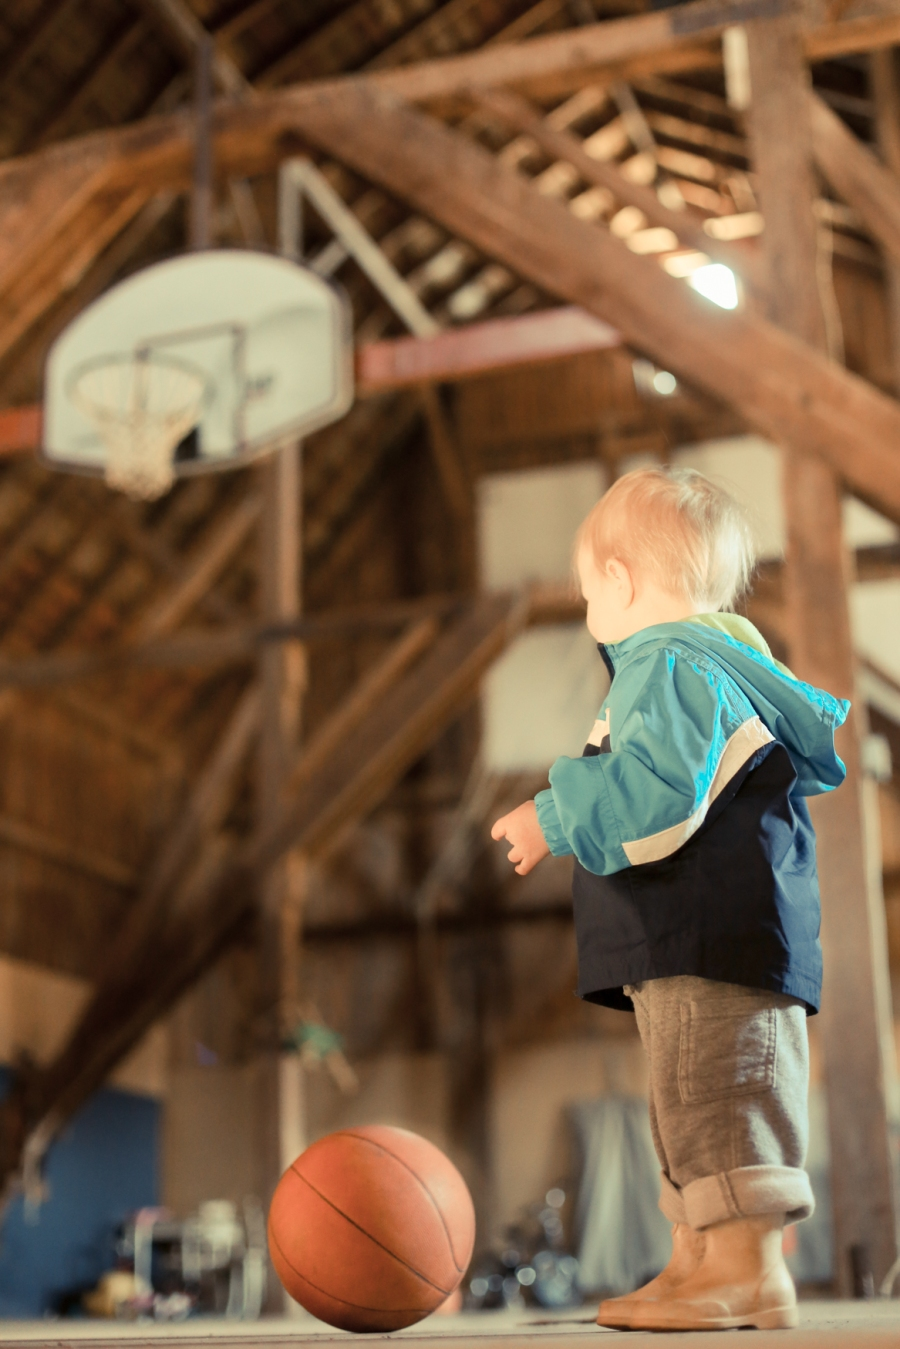 Gigi's Joy: basketball in the barn